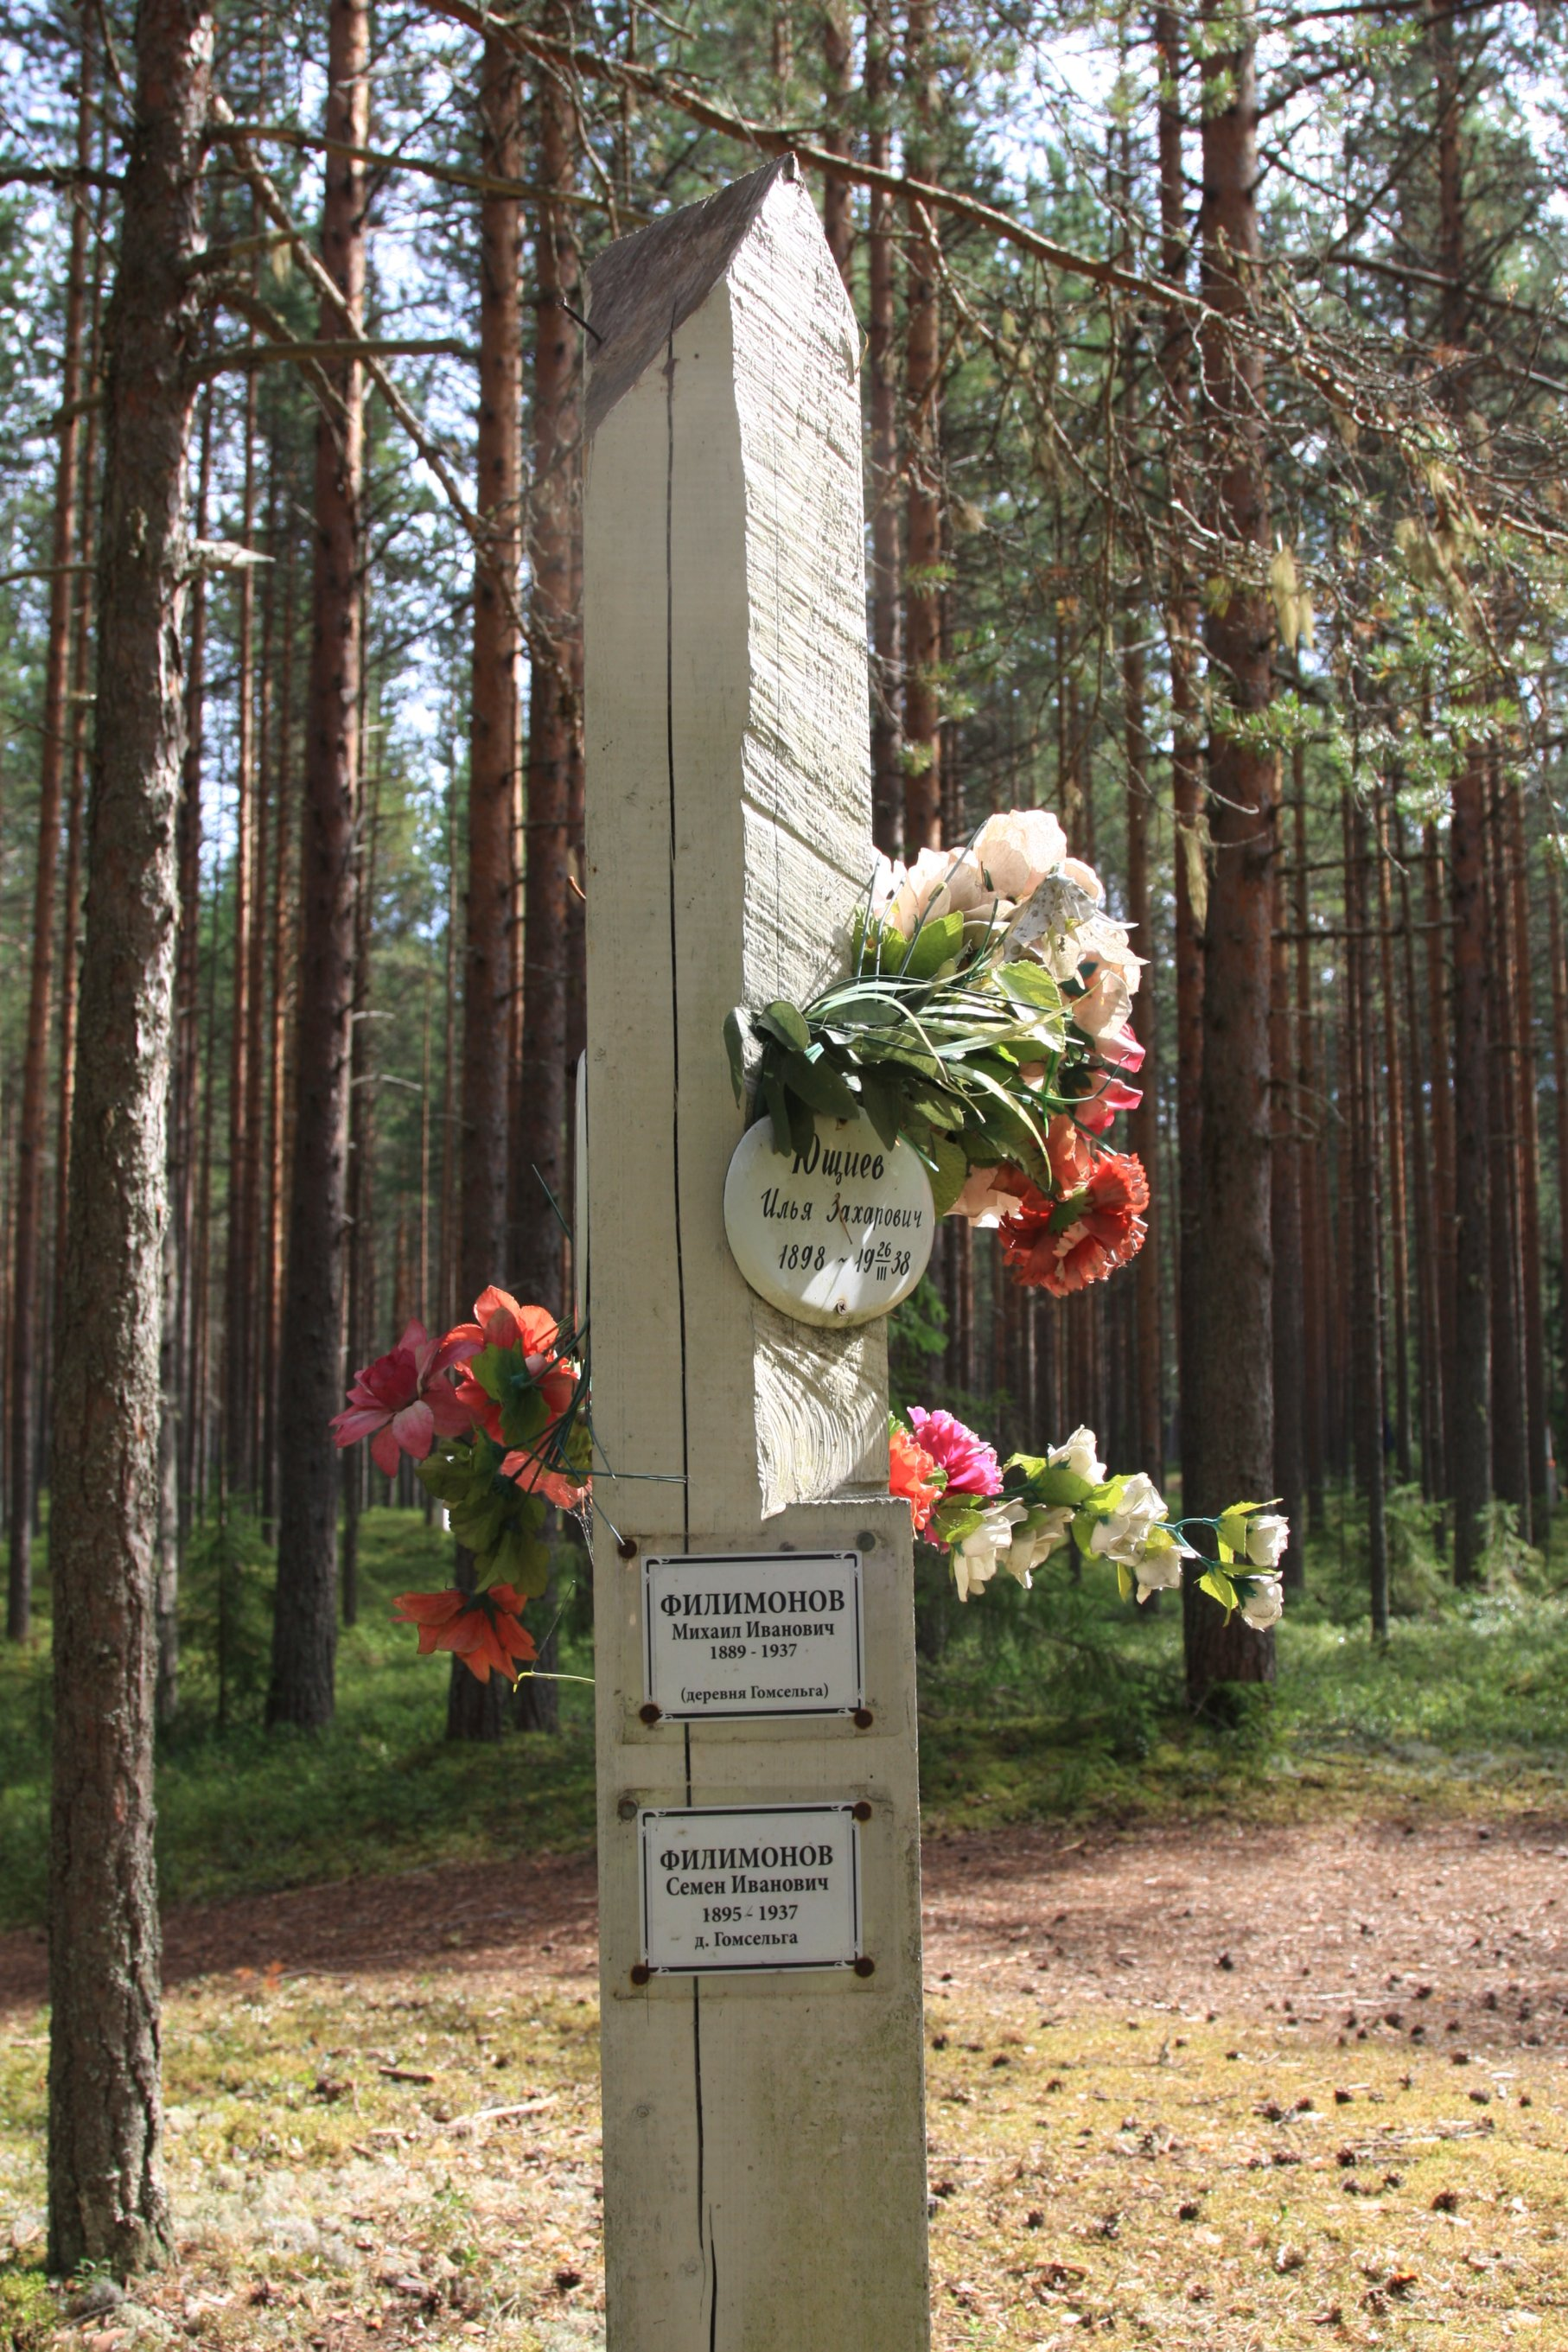 Памятная табличка «Филимонов Семен Иванович». Фото 04.08.2018.